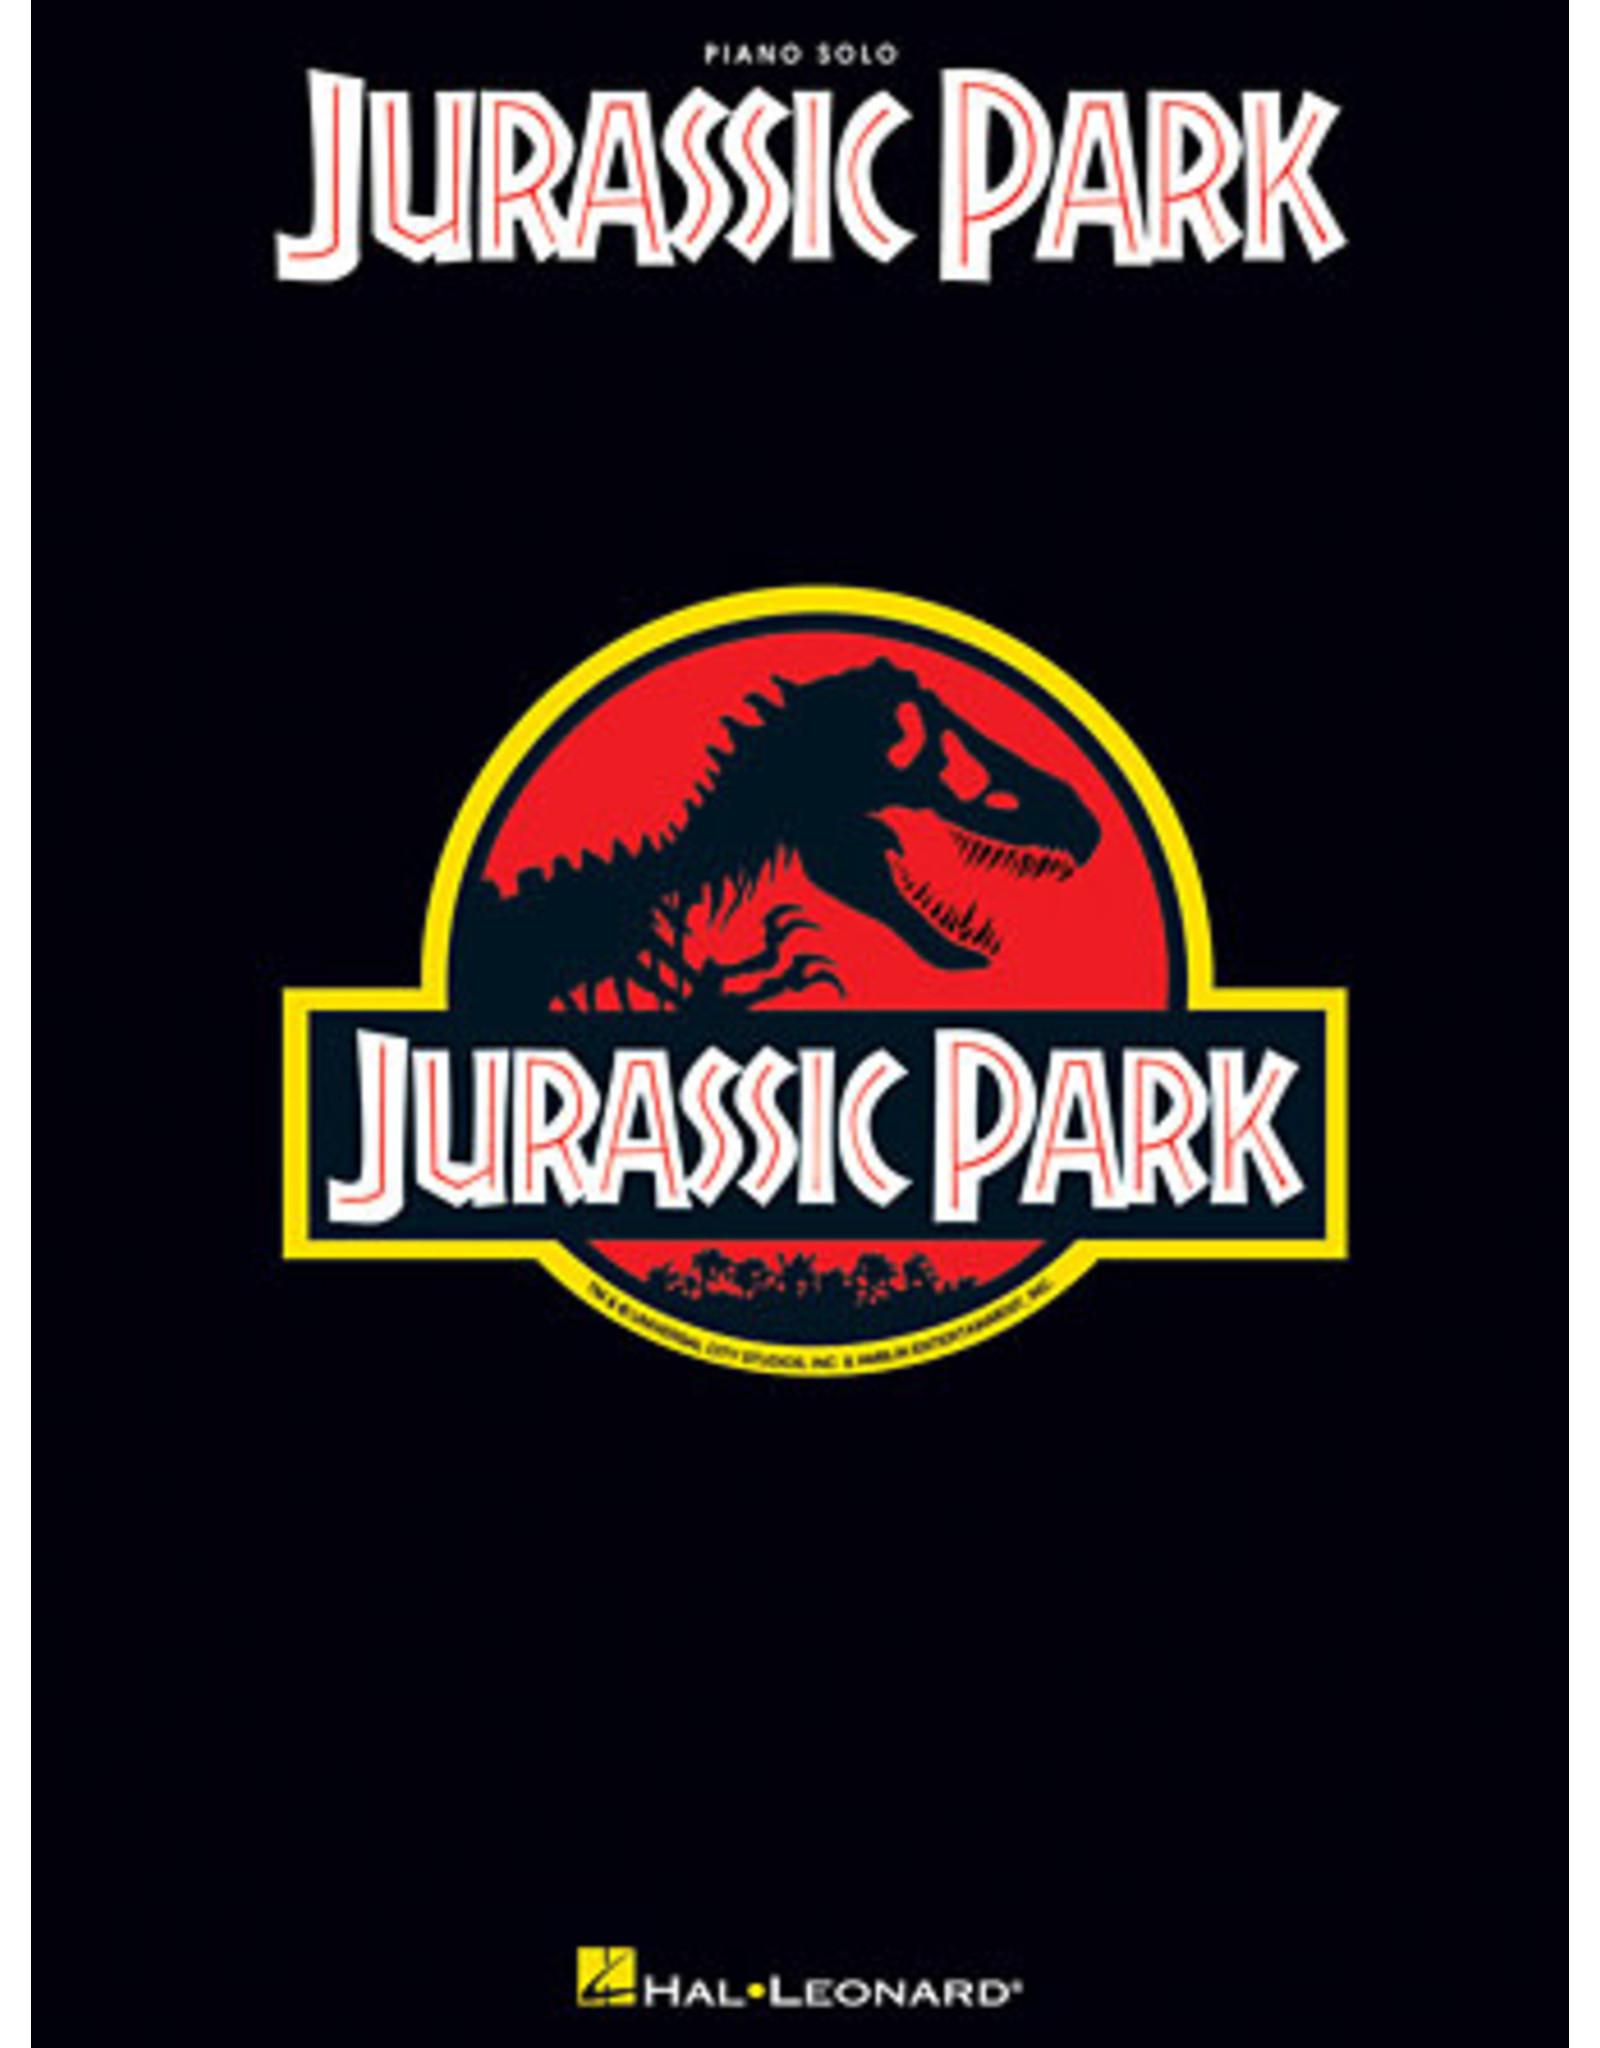 Hal Leonard Jurassic Park - Piano Solos from the Movie